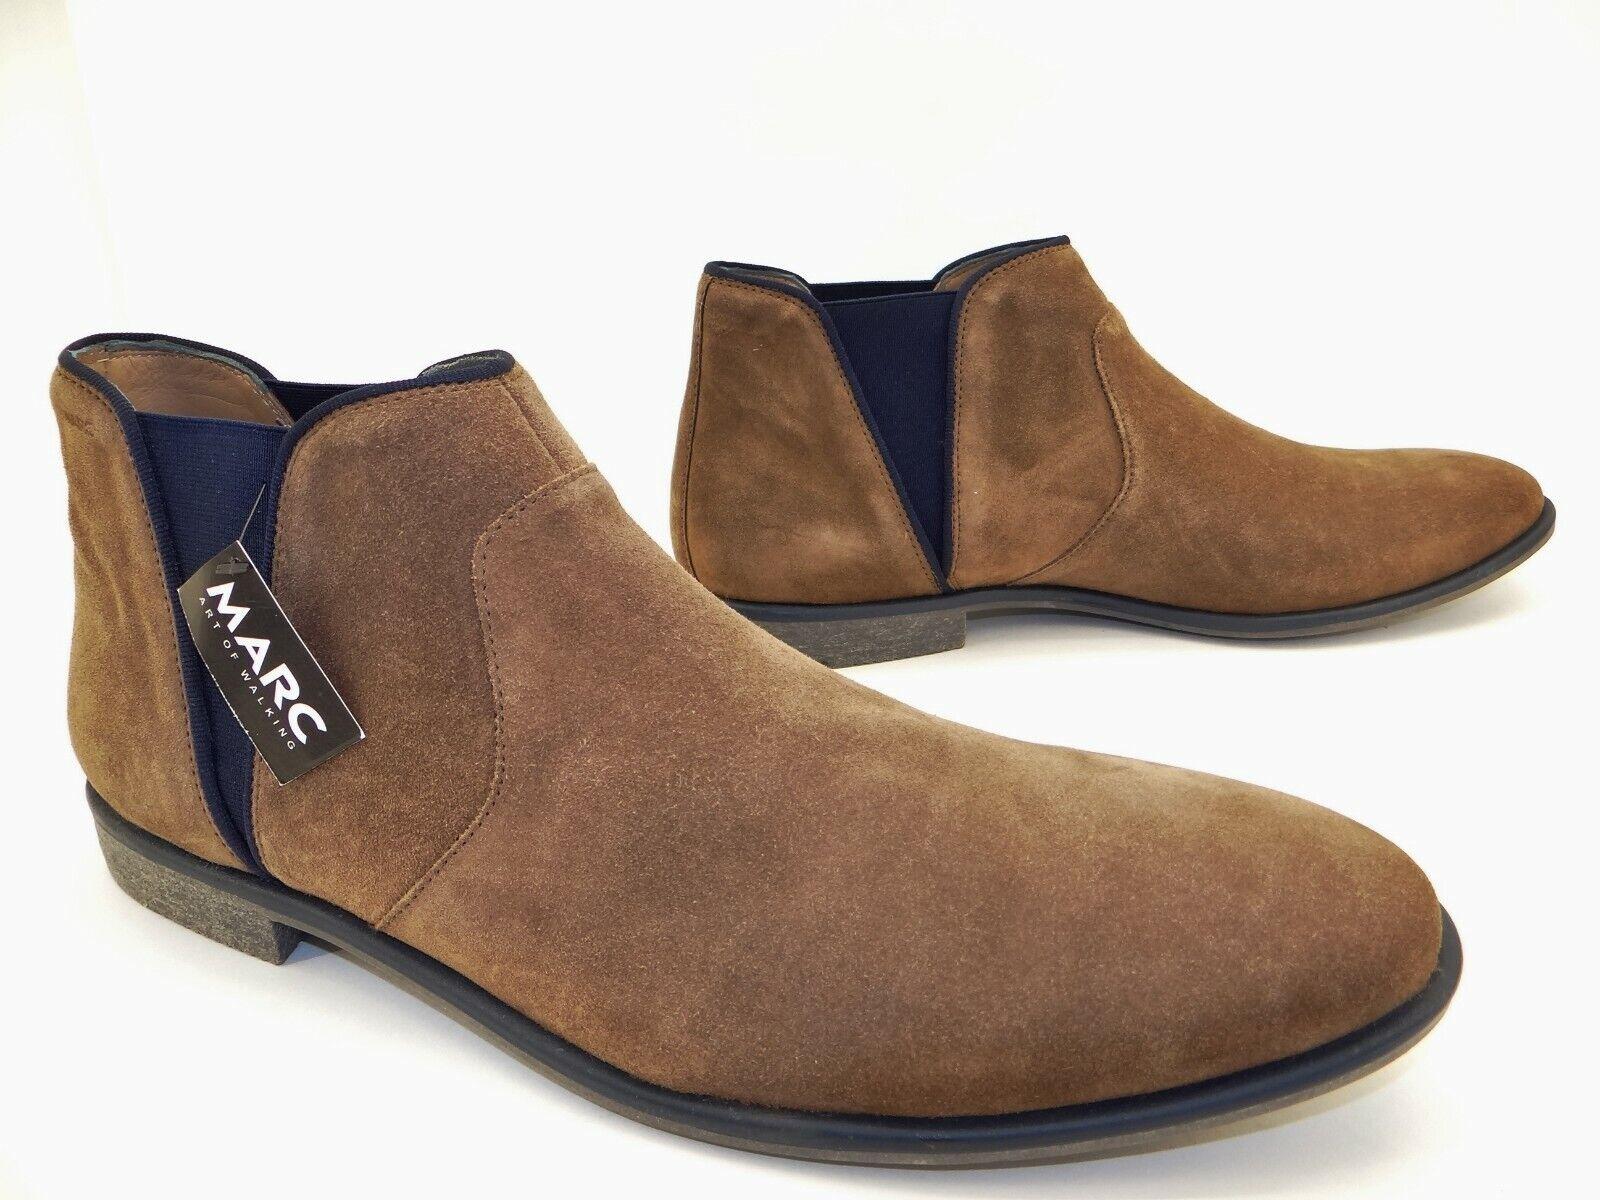 Schuhe Stiefeletten Stiefel Chelsea Herren Marc xCoedB